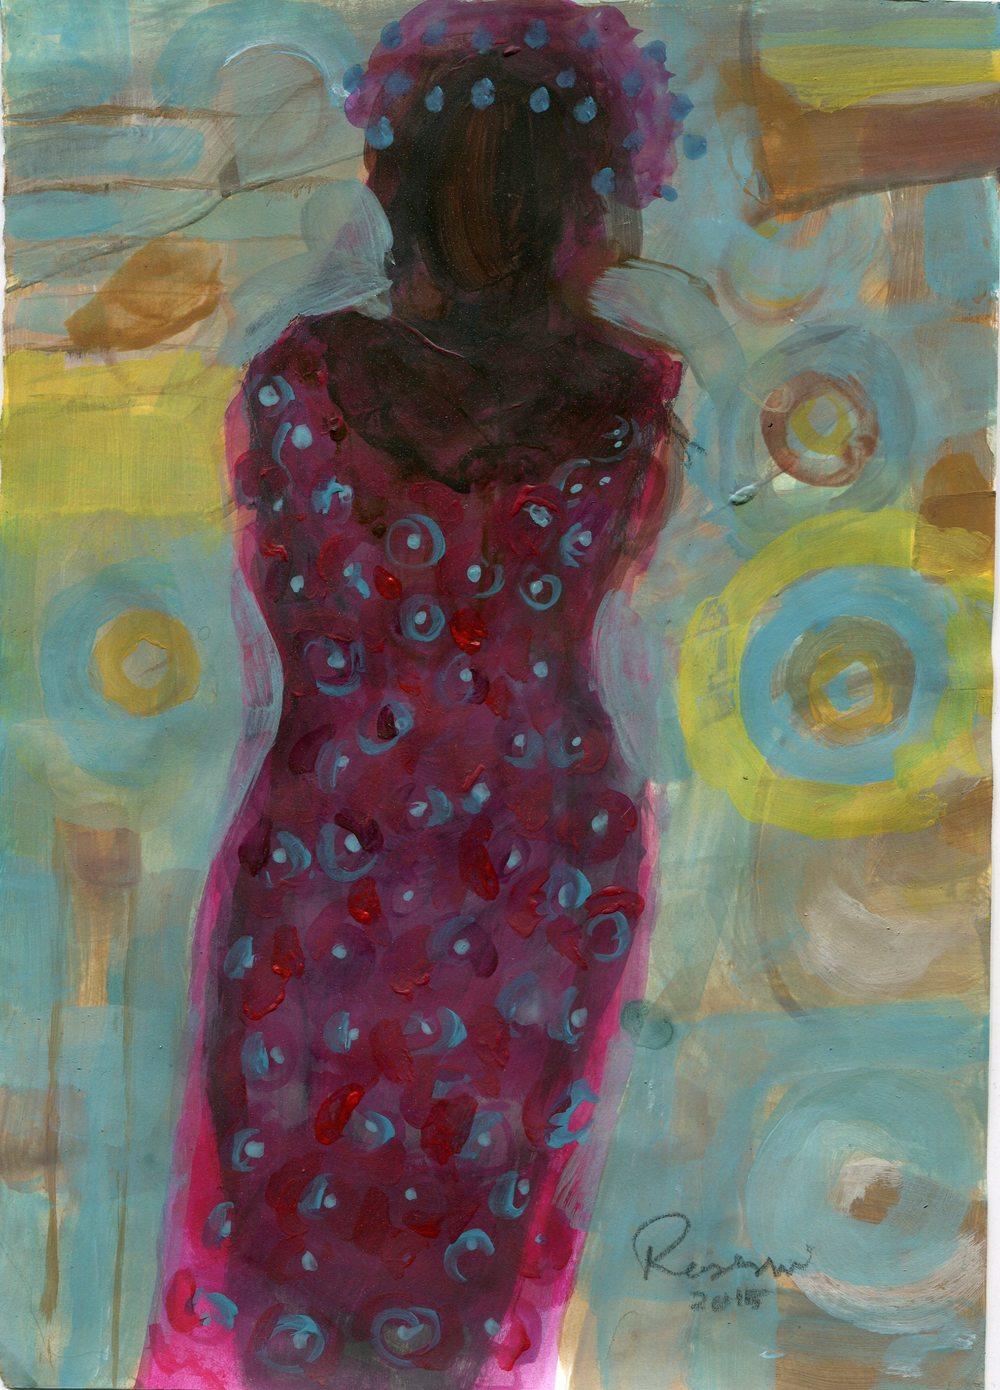 9b Oshi,Raja-Figure 2,Acrylic wash on paper.jpg